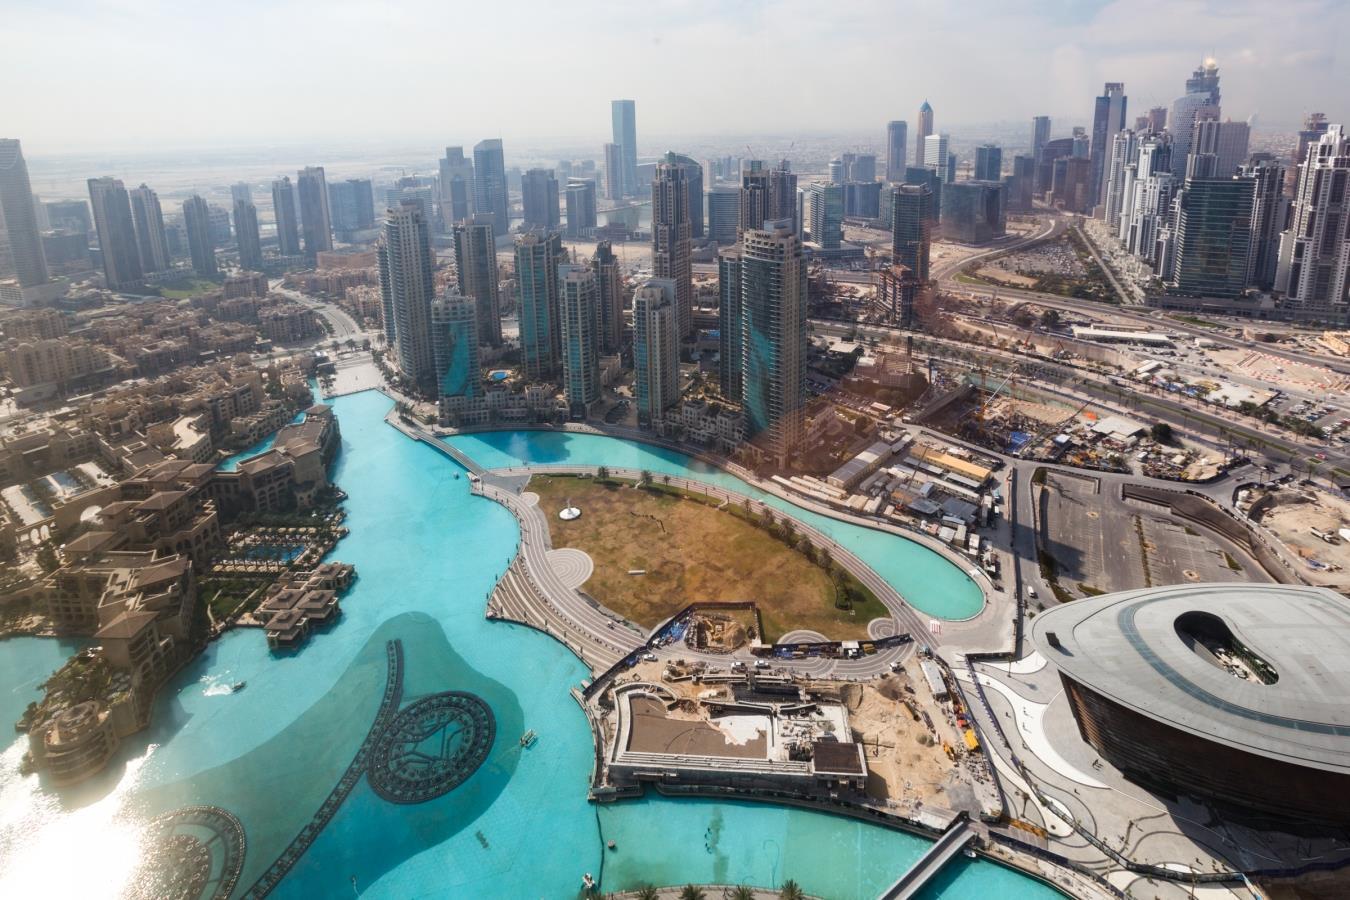 Opulent Fountain and Burj Al Arab View